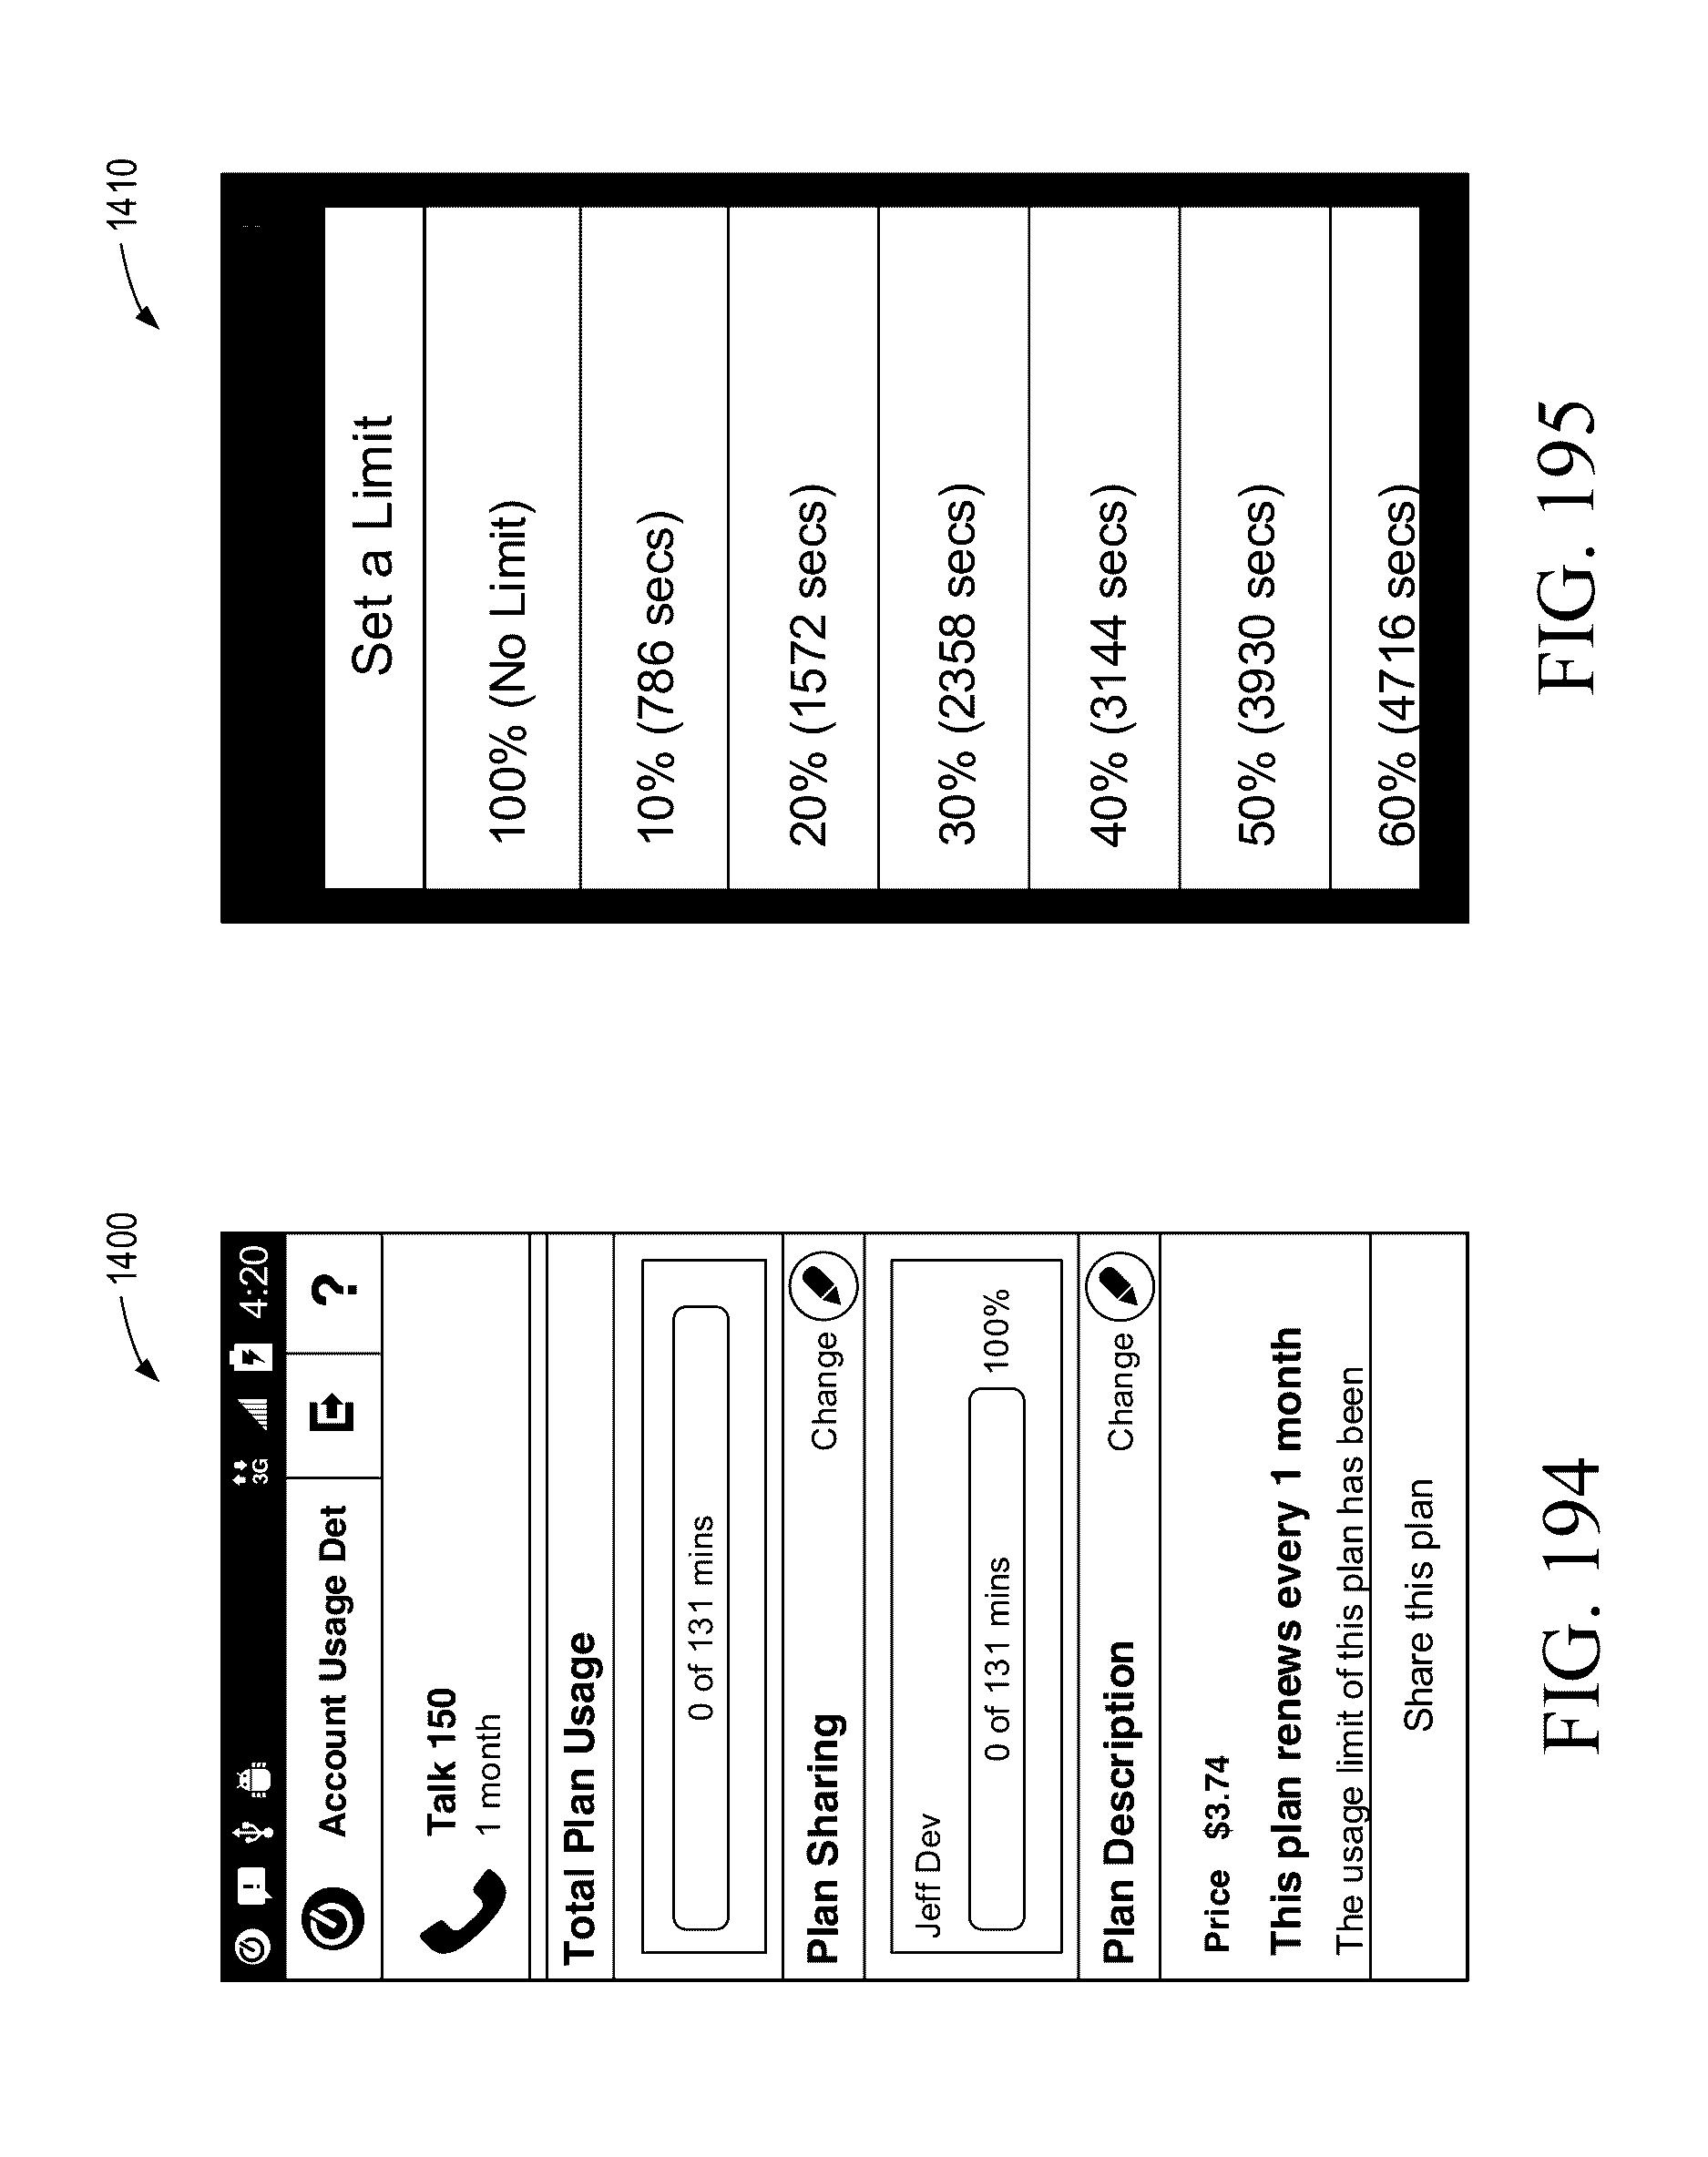 Patent US 9,557,889 B2